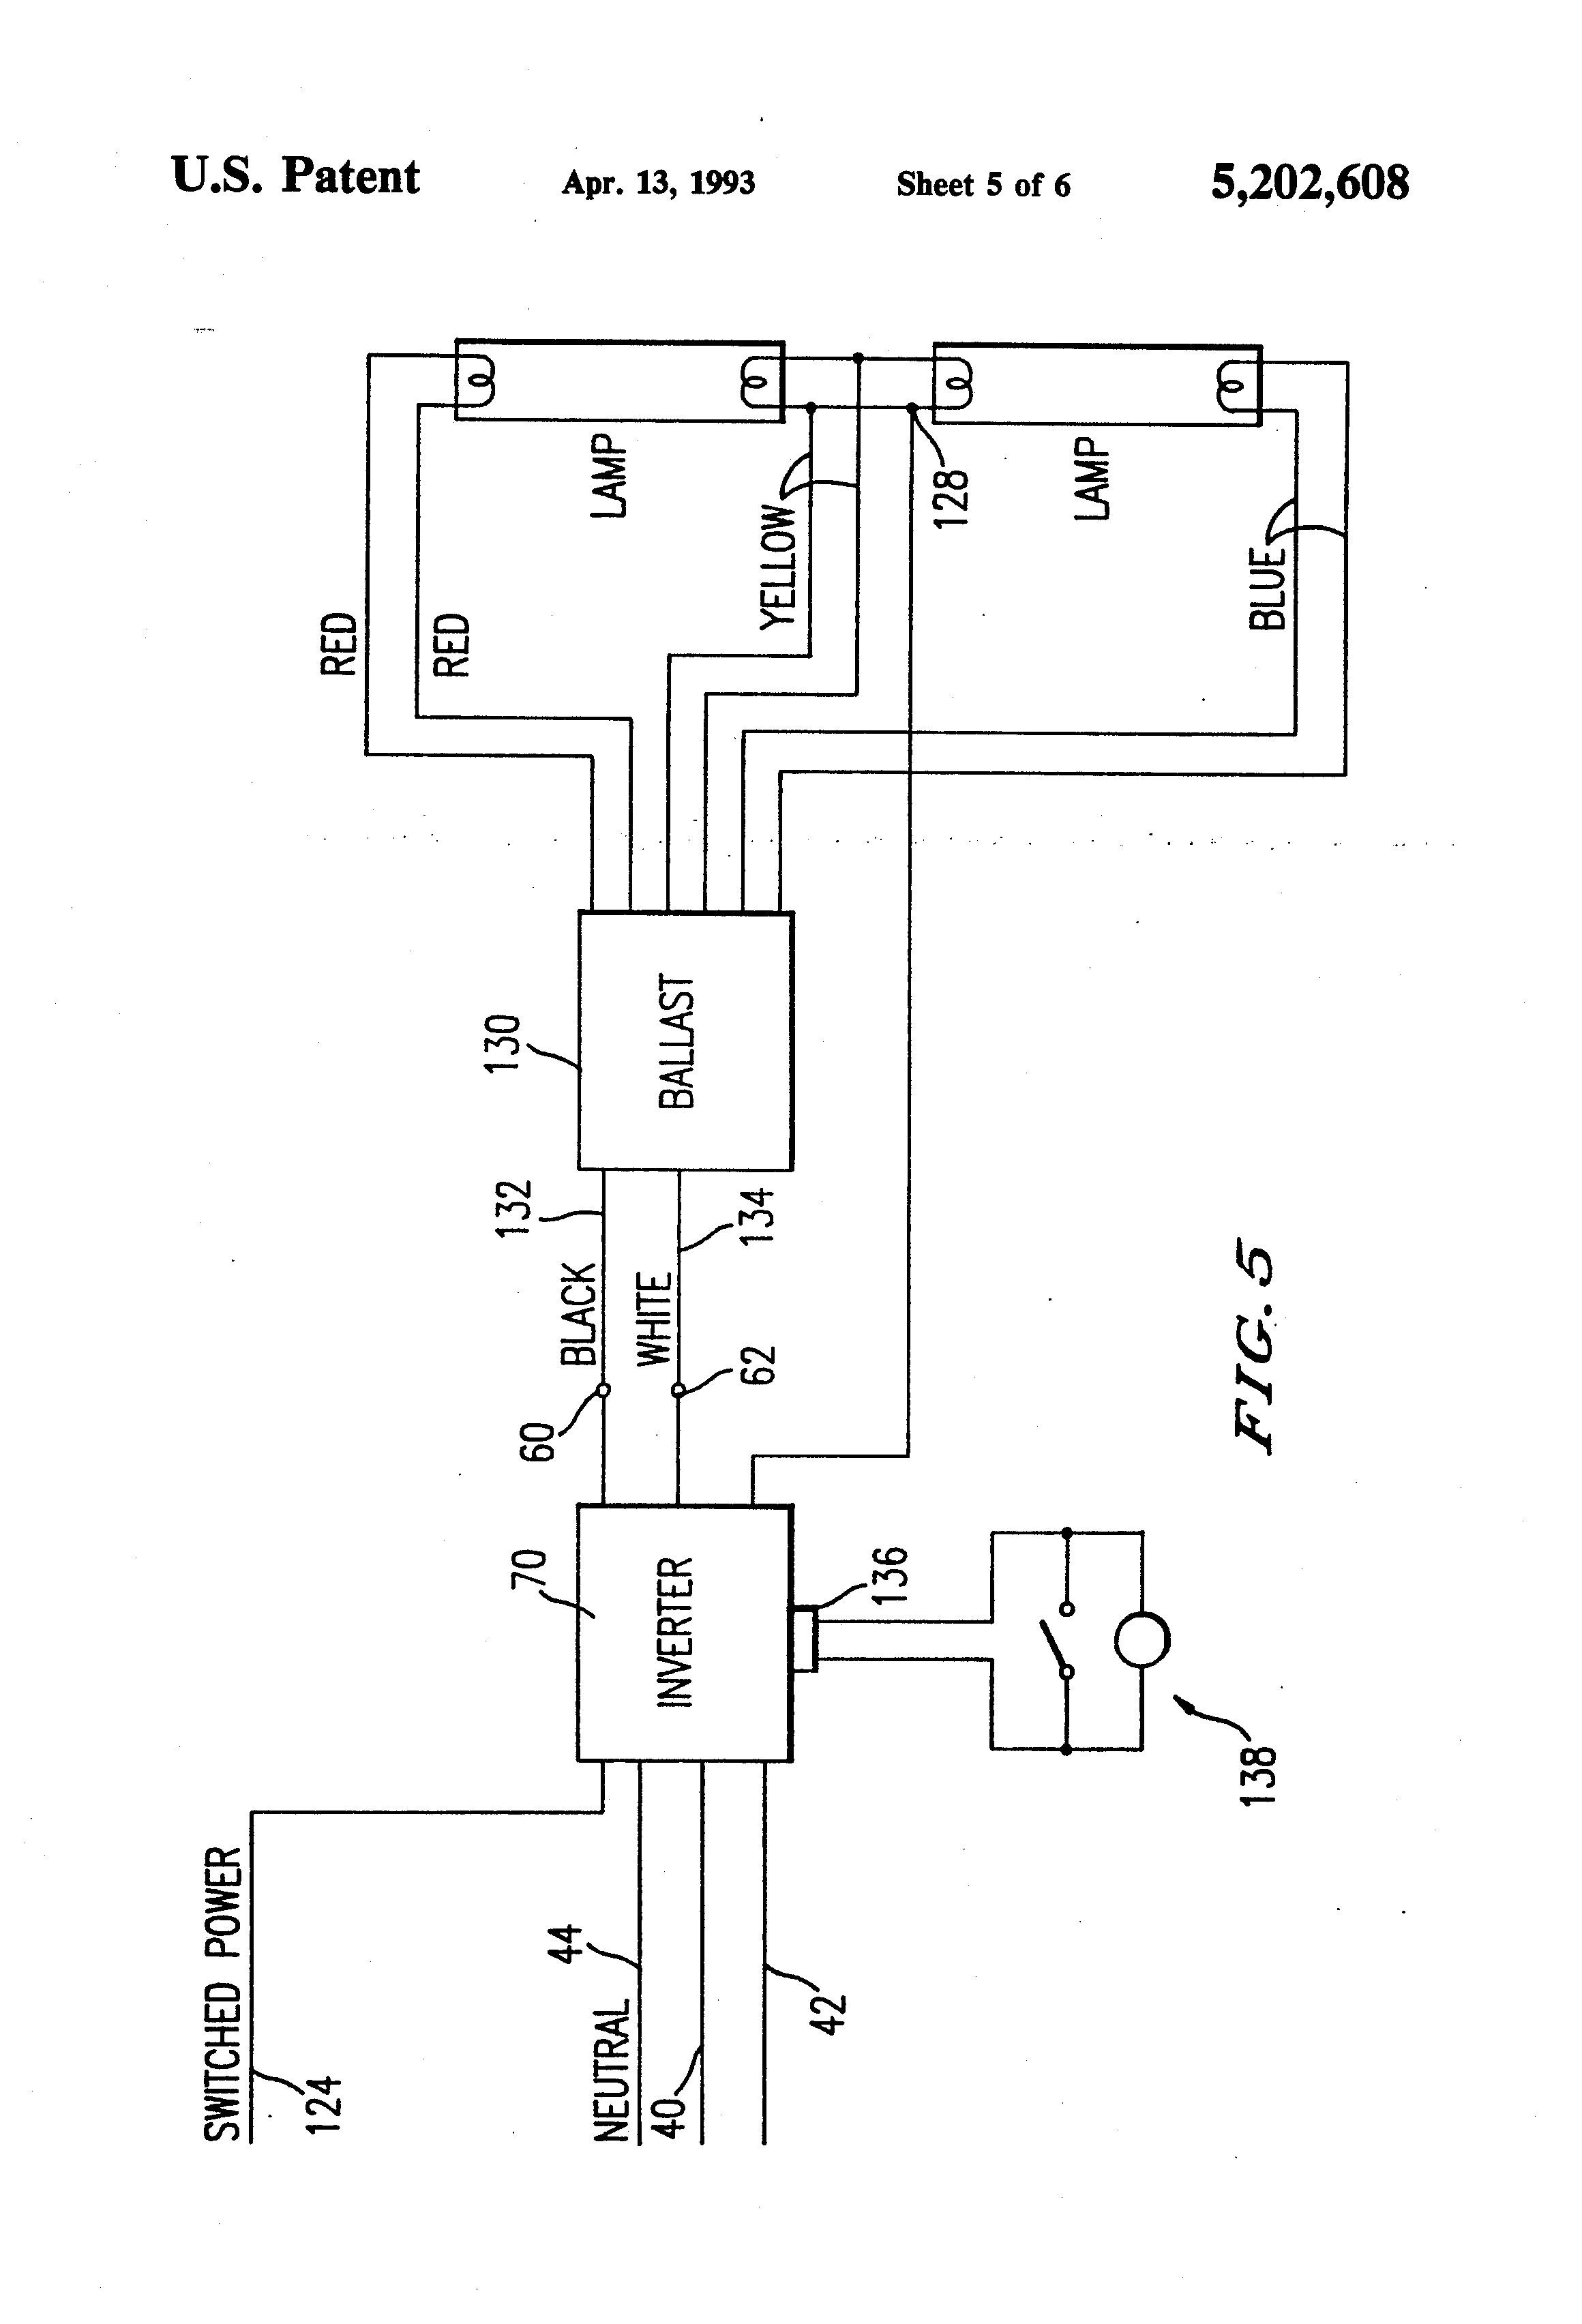 Fulham Wh5 120 L Wiring Diagram